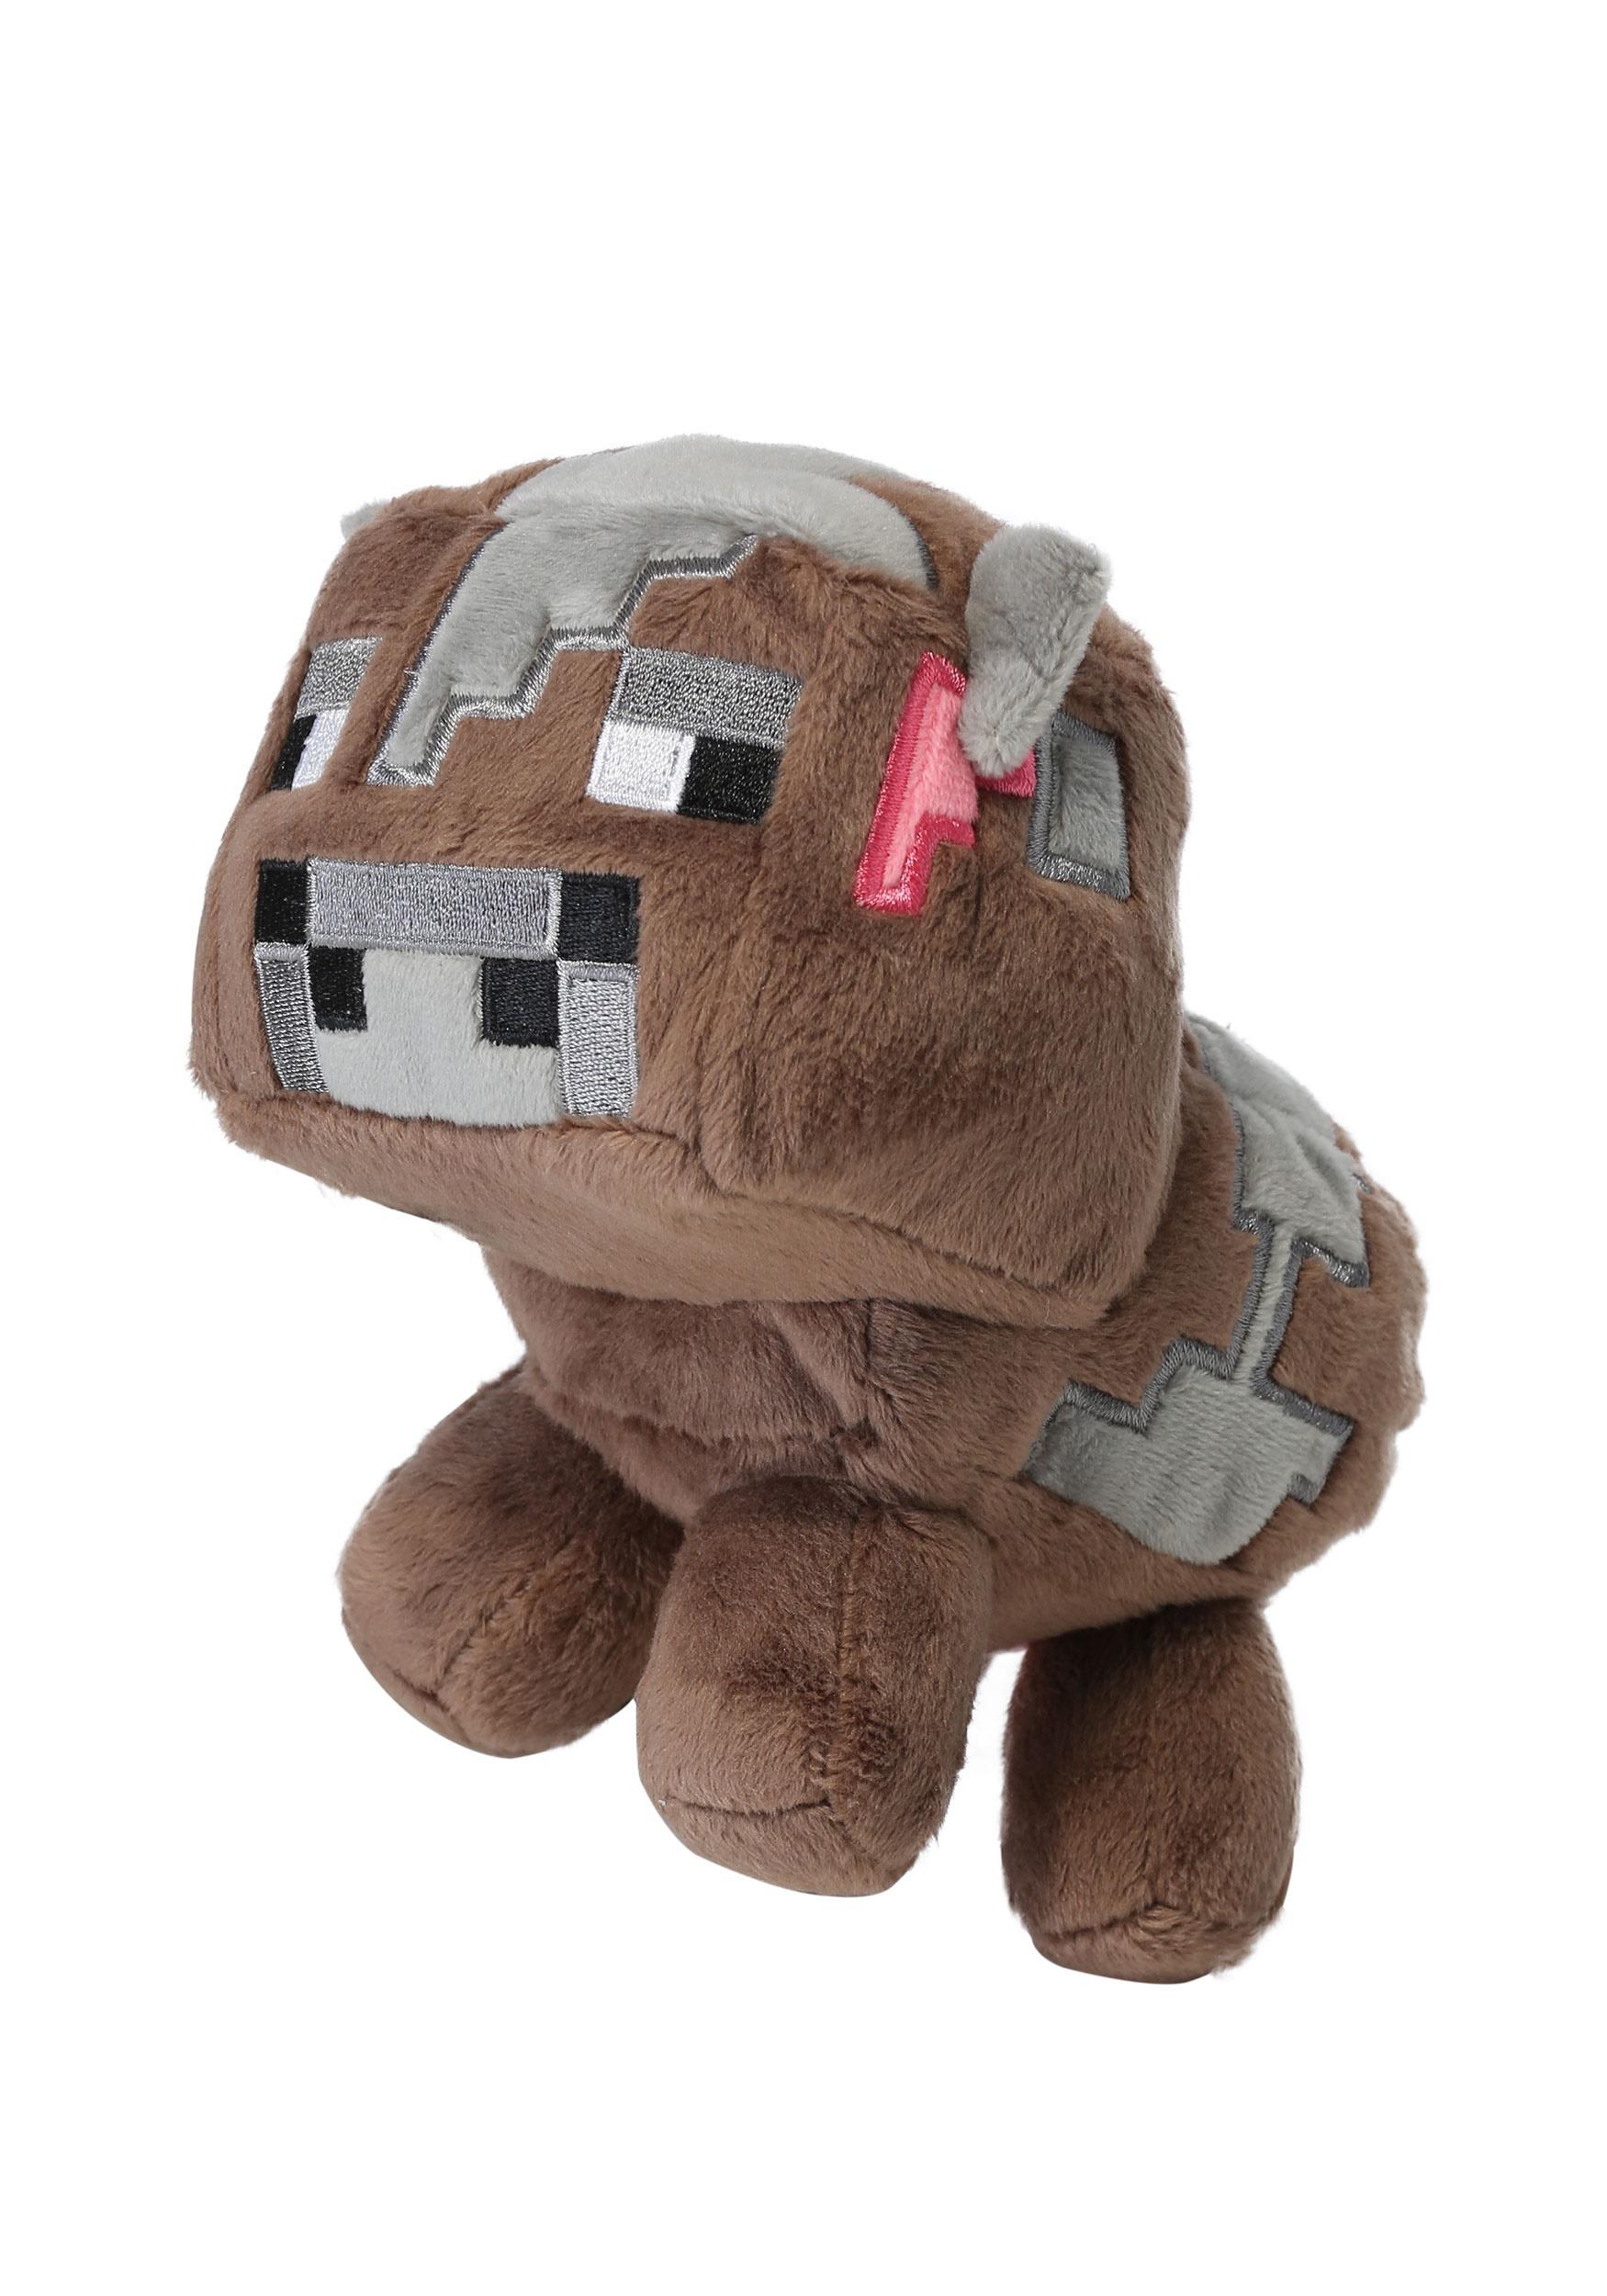 Minecraft Baby Cow Stuffed Figure JI7182